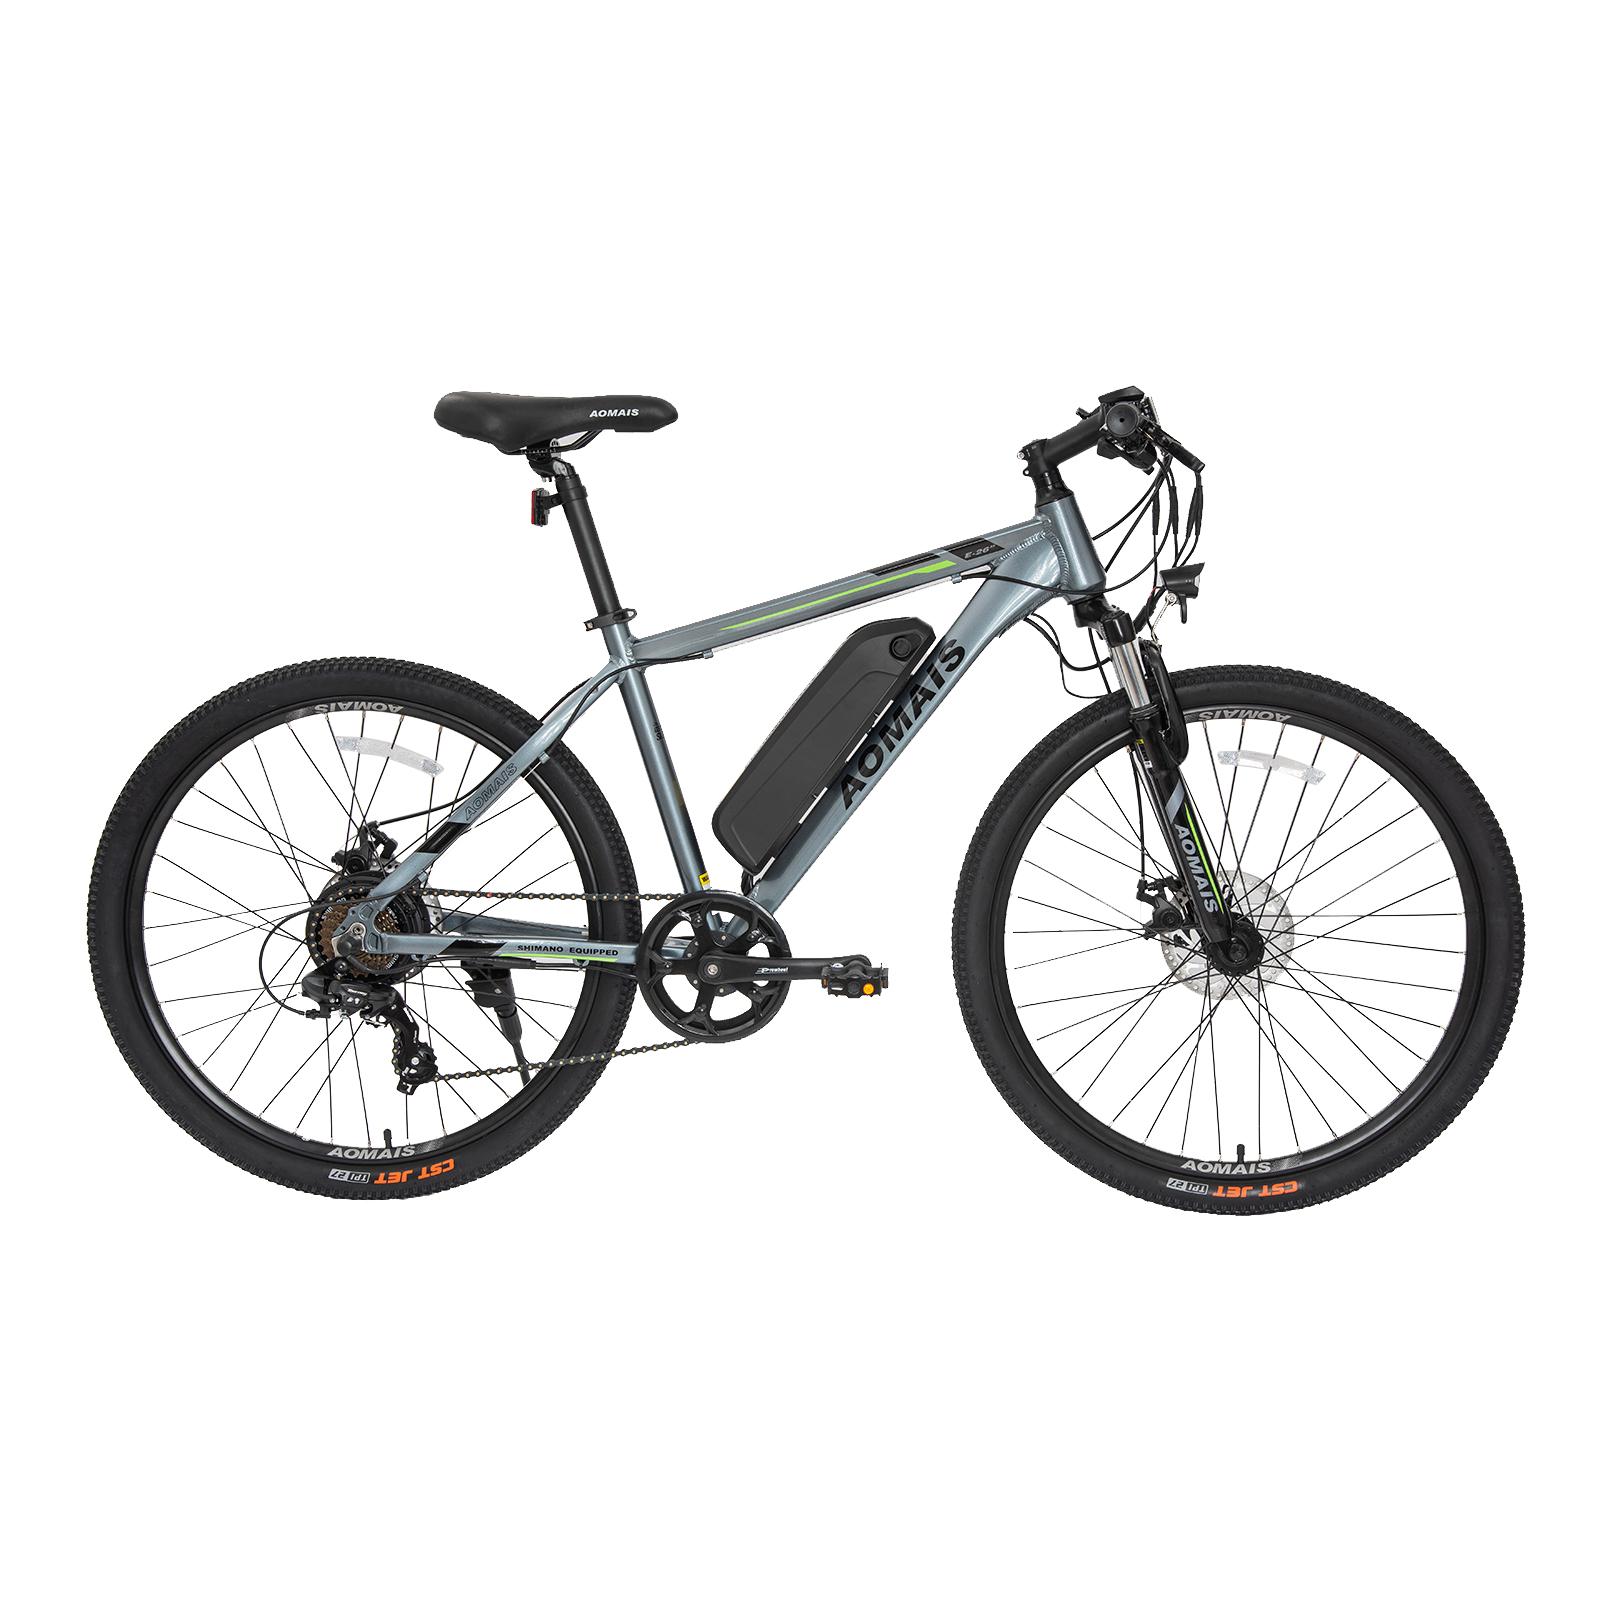 "Murtisol 26"" Aluminum Electric Bicycle Mountain Bike E-Bike 4 Speeds Battery 36V 250W"